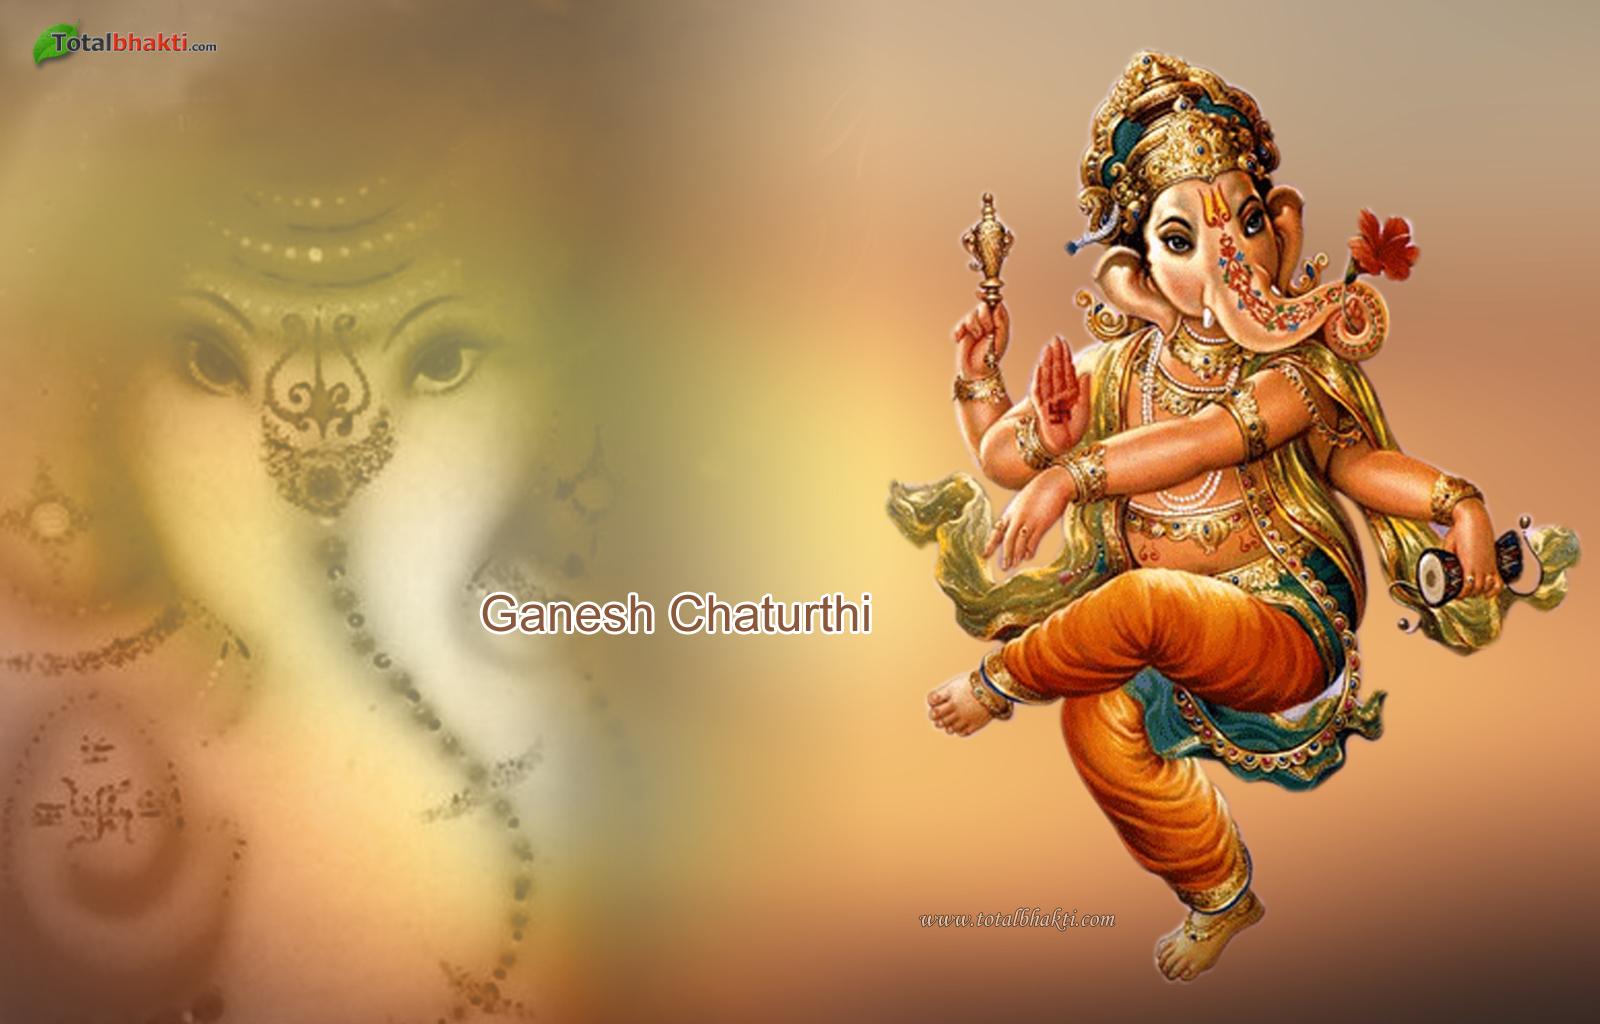 ganesh chaturthi - photo #14